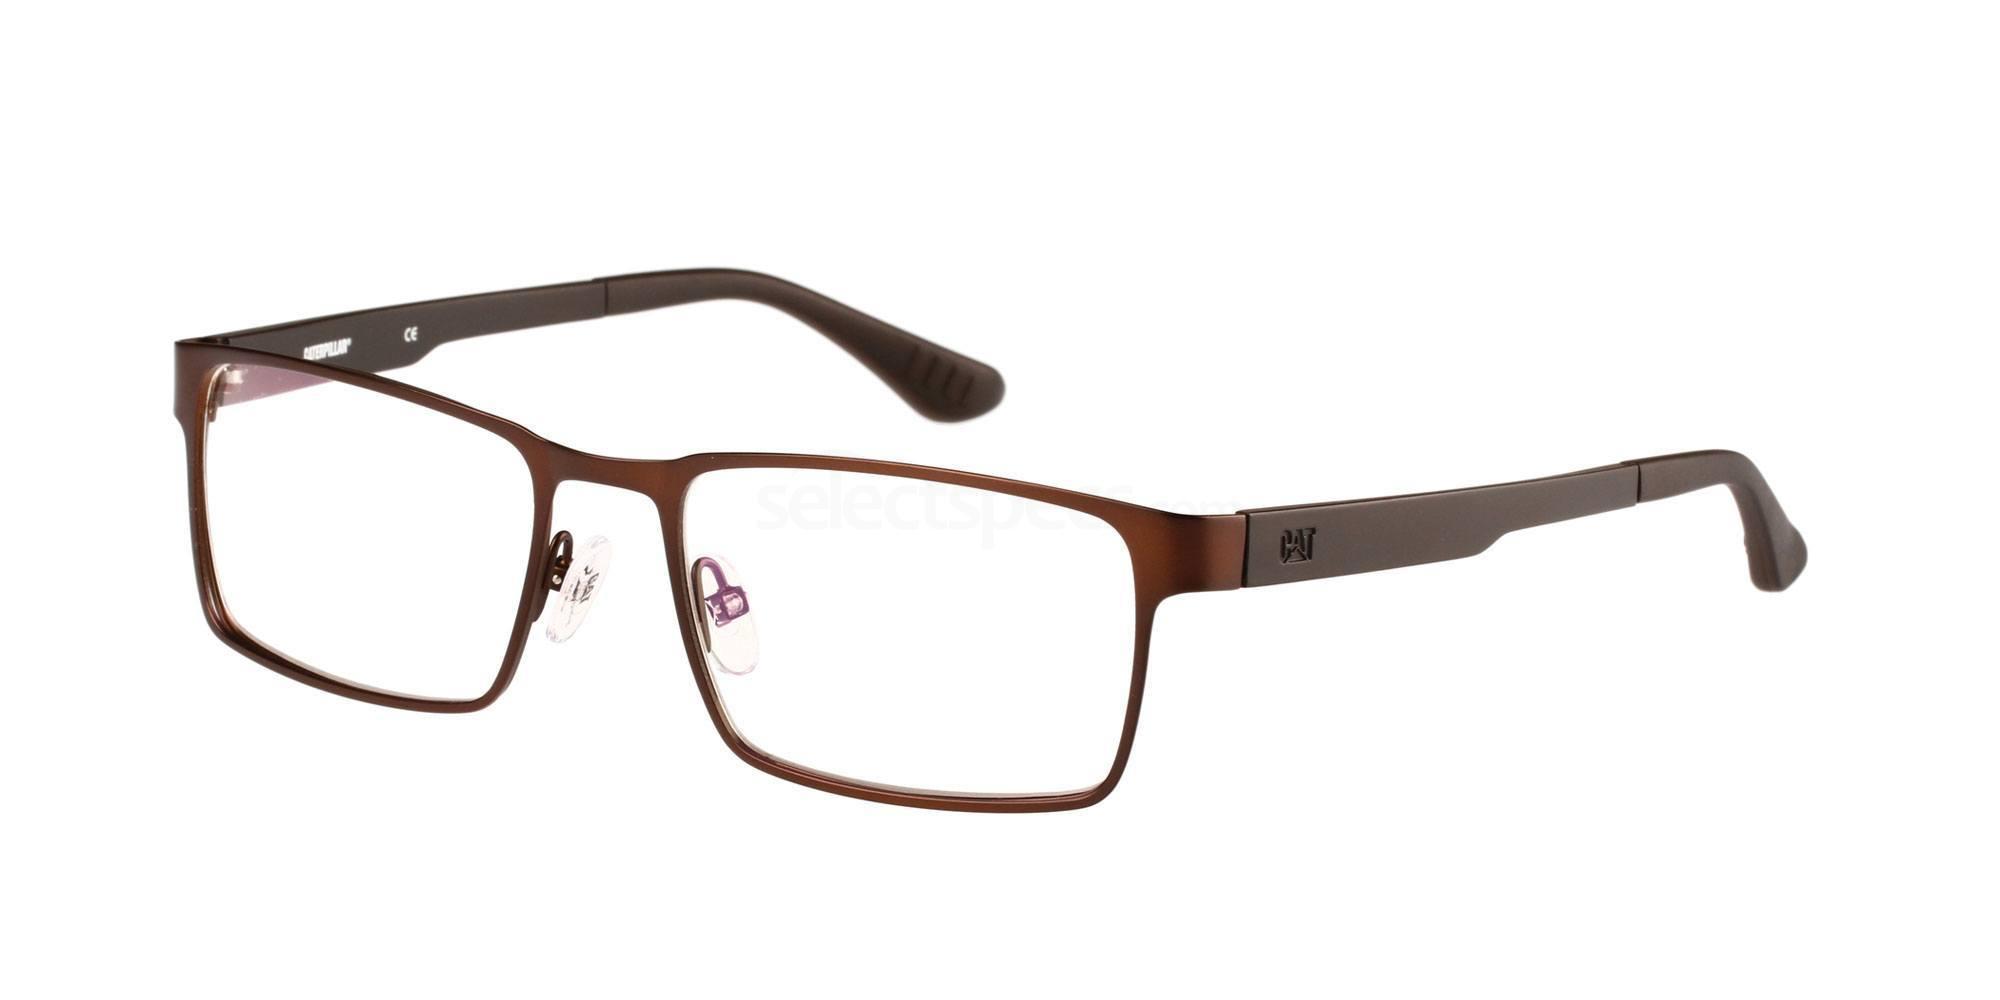 003 CTO J06 Glasses, CAT